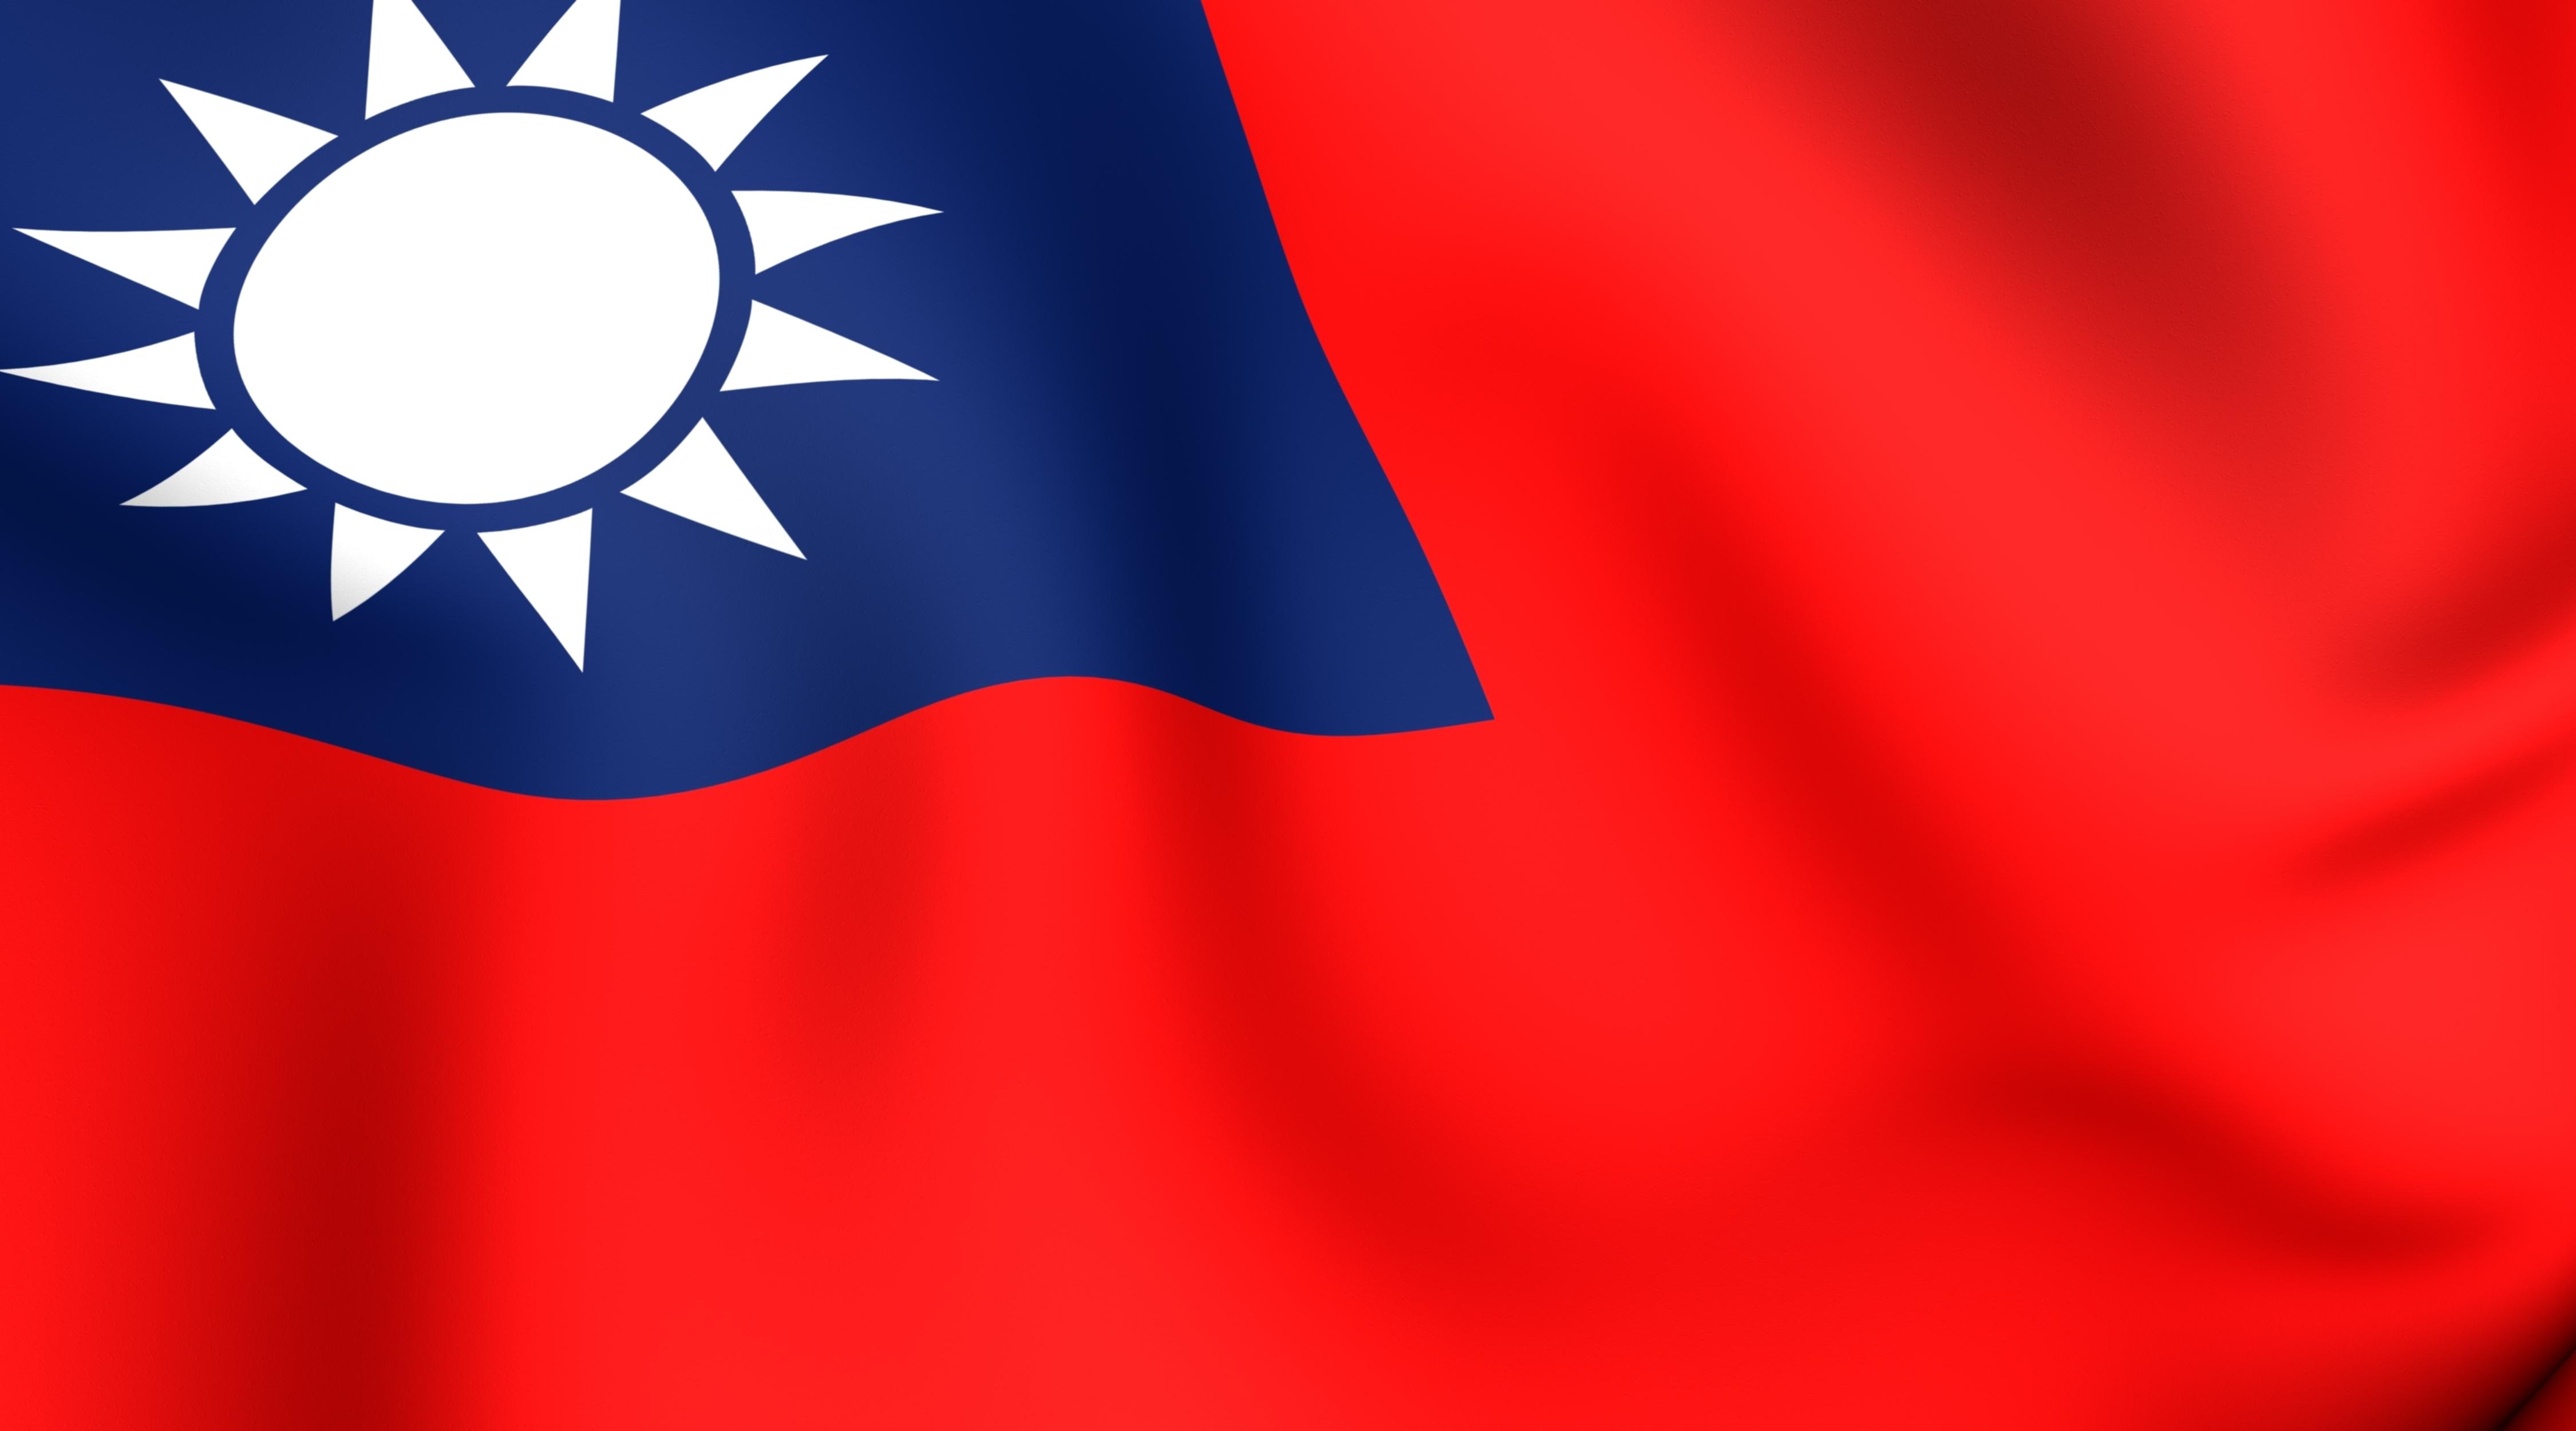 China se opone a que Taiwán sea Miembro Fundador del AIIB